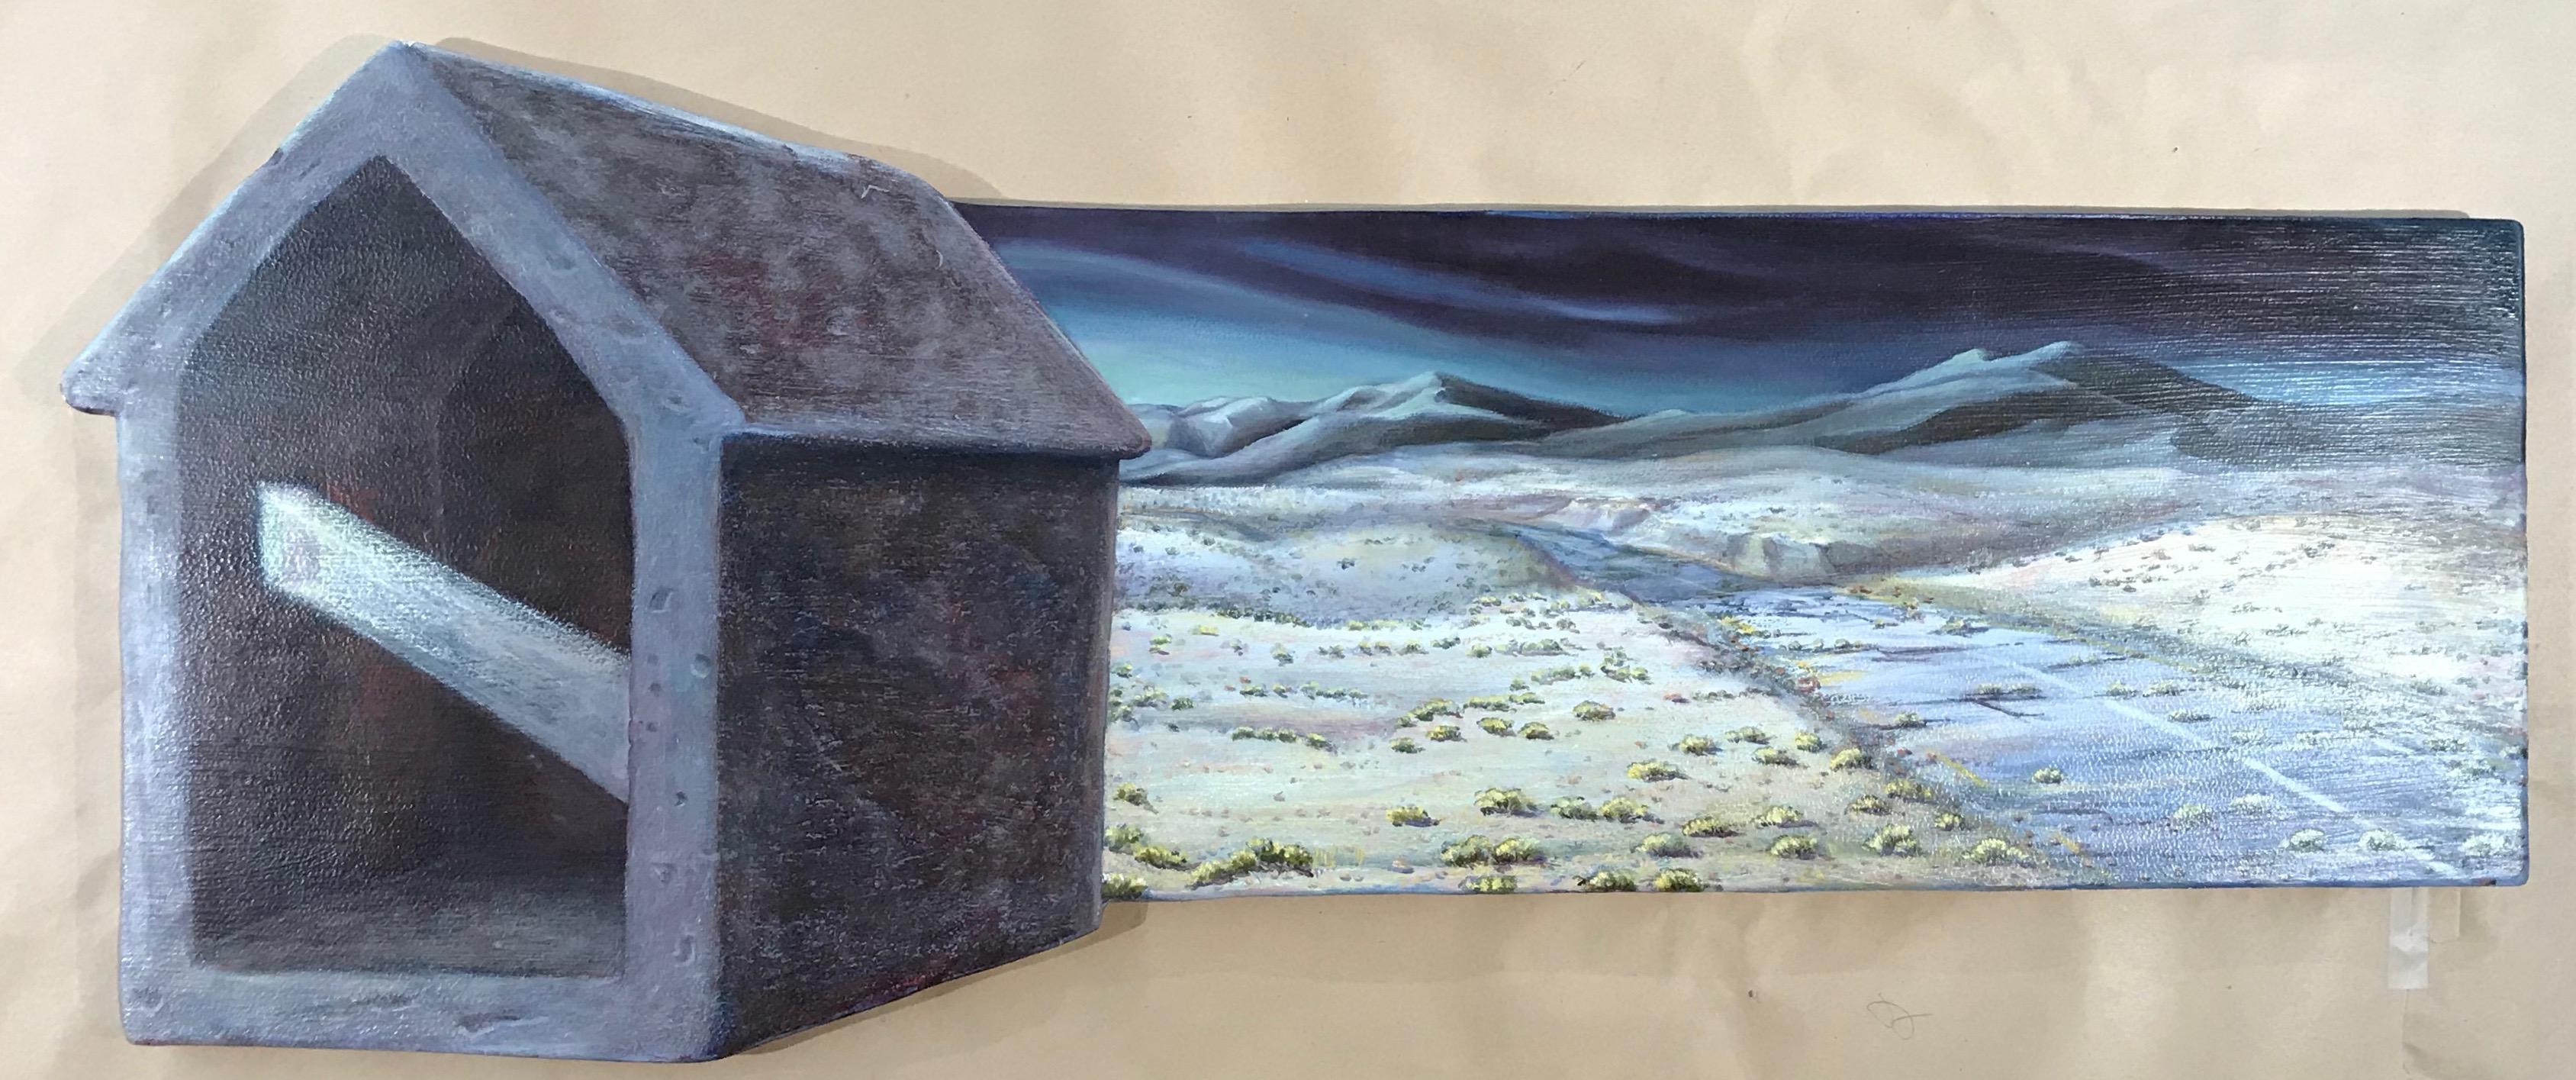 Ancient Highway, trompe l'oiel, oil painting, ruins, road, western landscape